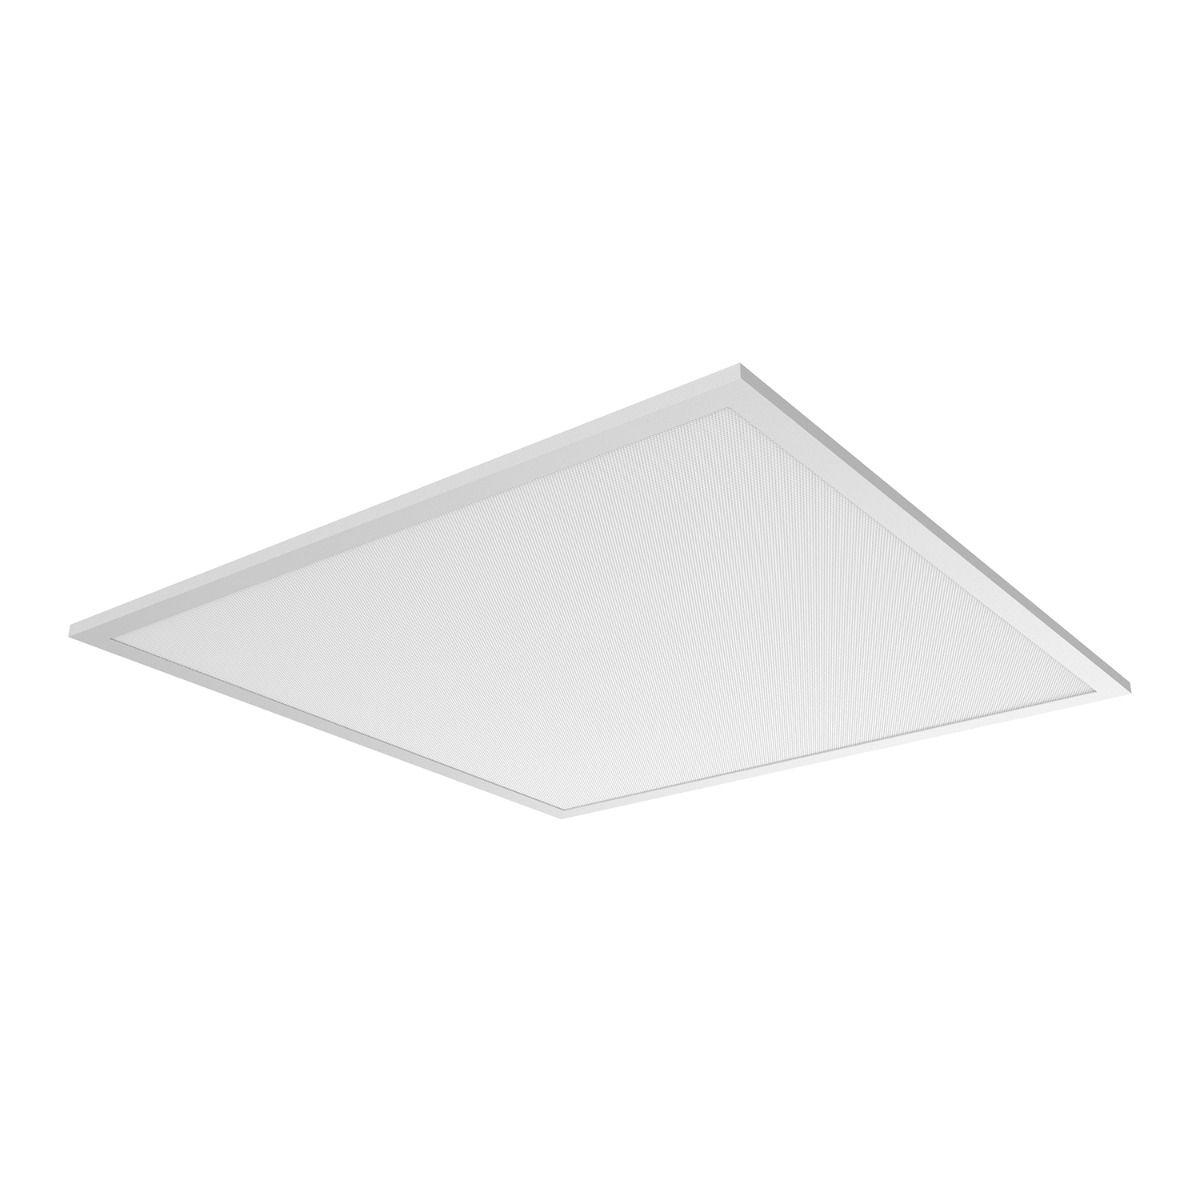 Noxion LED Panel Delta Pro V3 DALI 30W 3000K 3960lm 60x60cm UGR <19 | Warm White - Replaces 4x18W